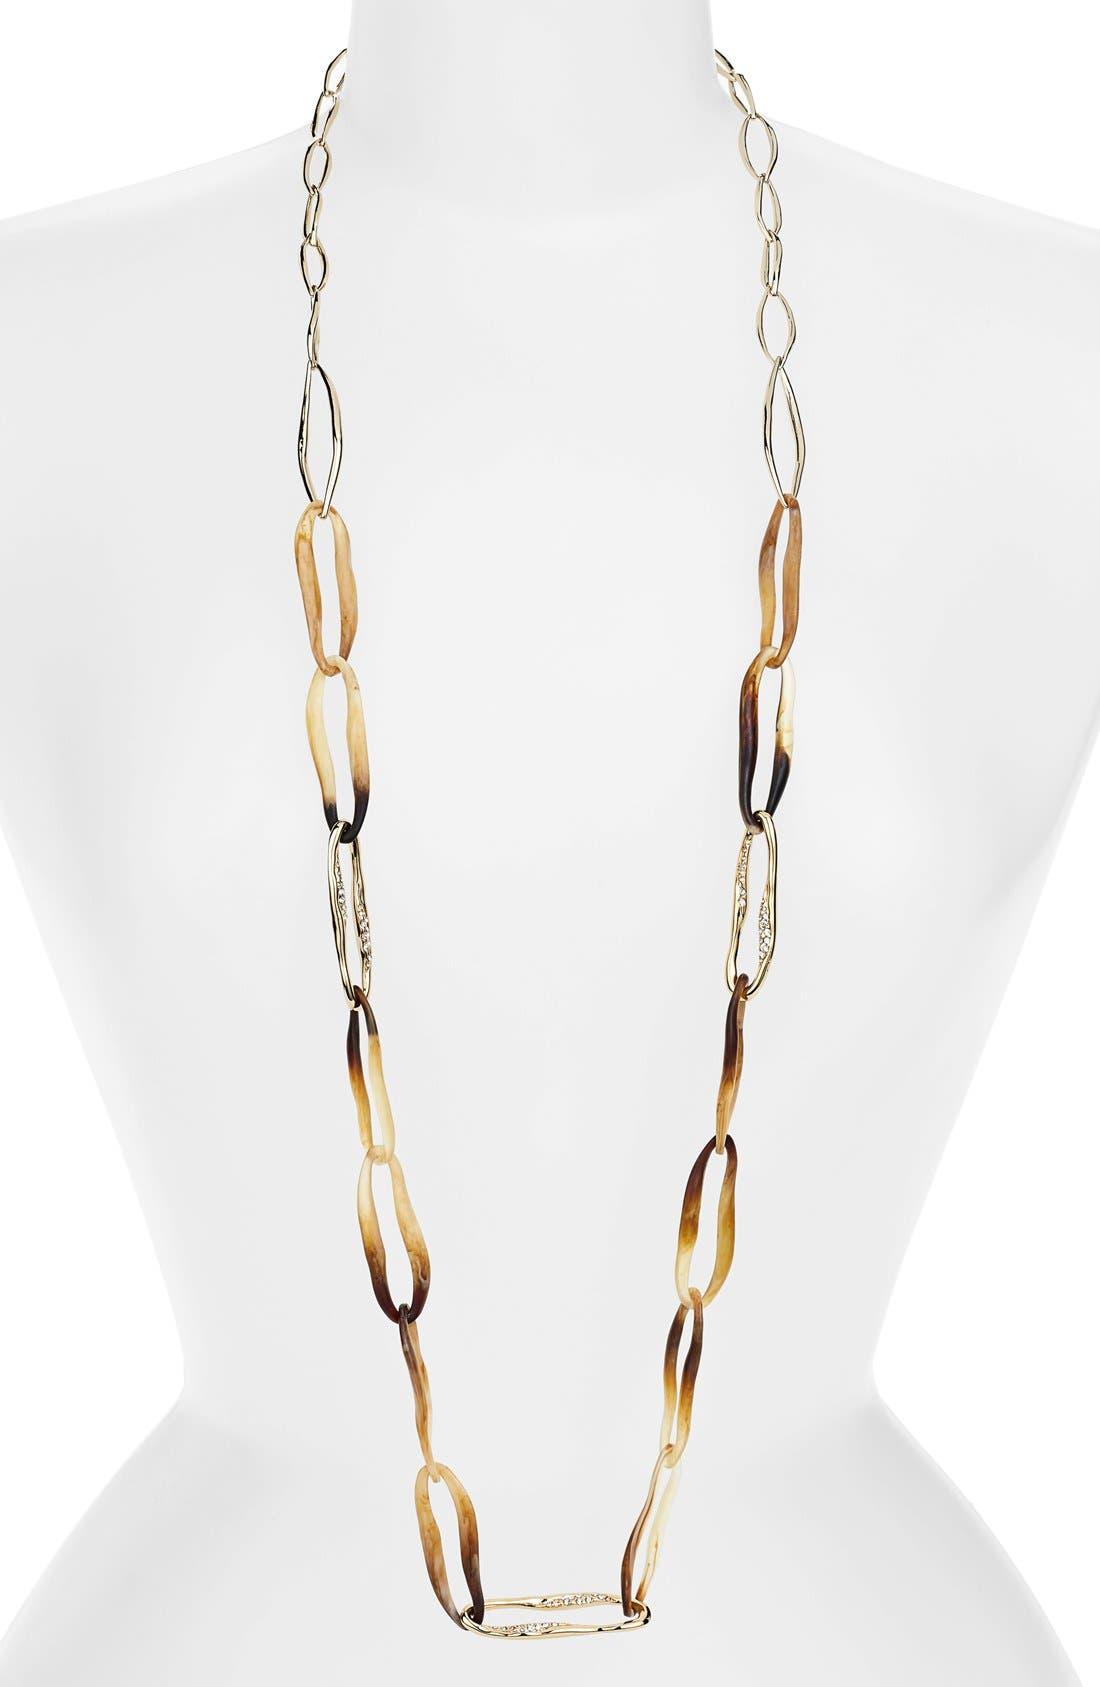 Alternate Image 1 Selected - Alexis Bittar 'Miss Havisham - Liquid' Extra Long Link Necklace